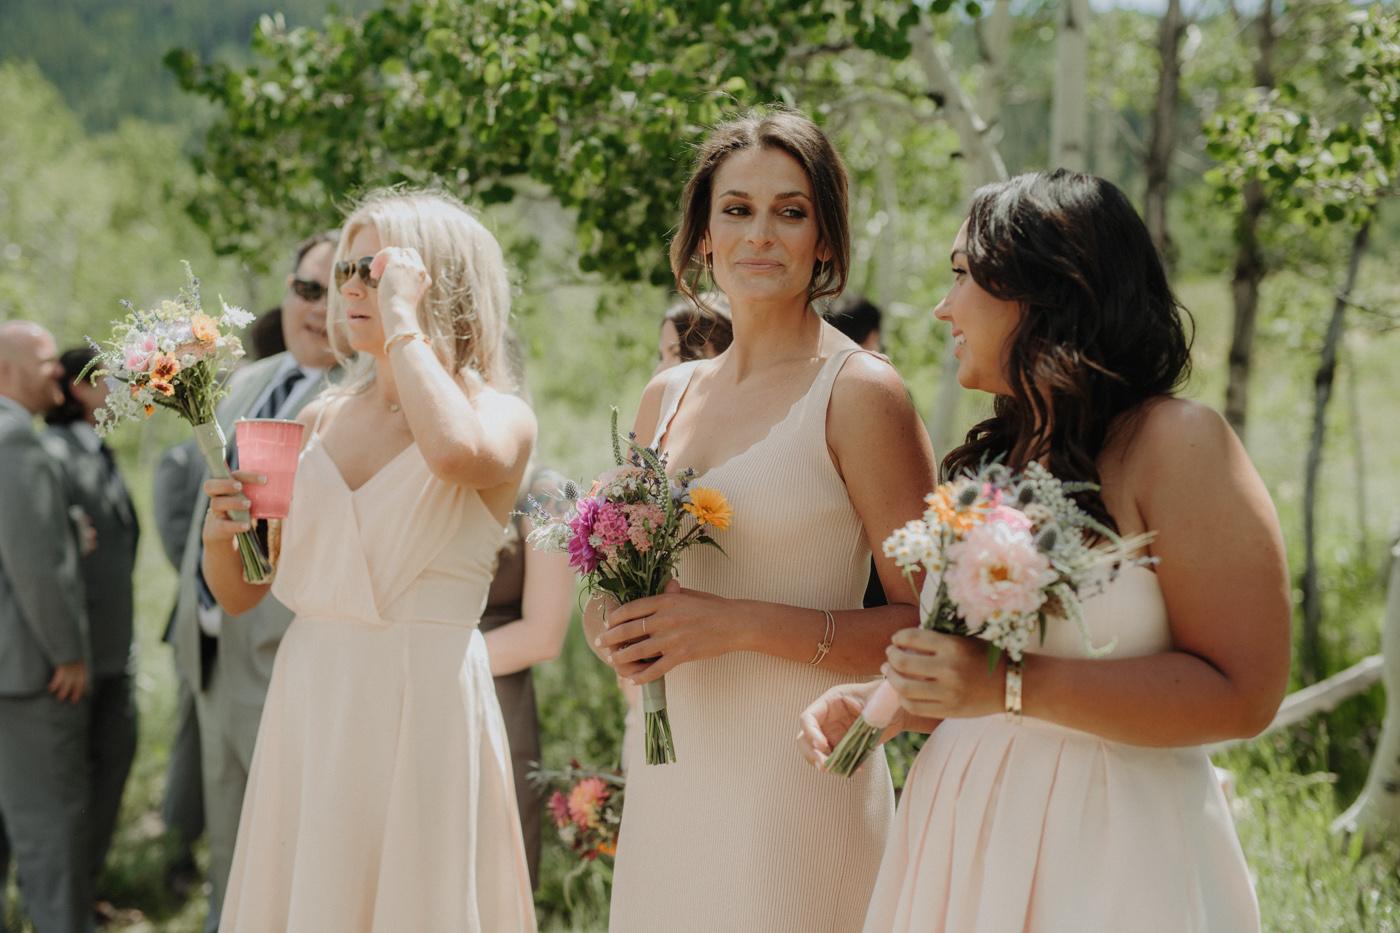 woods-walk-trail-crested-butte-colorado-wedding-18.jpg